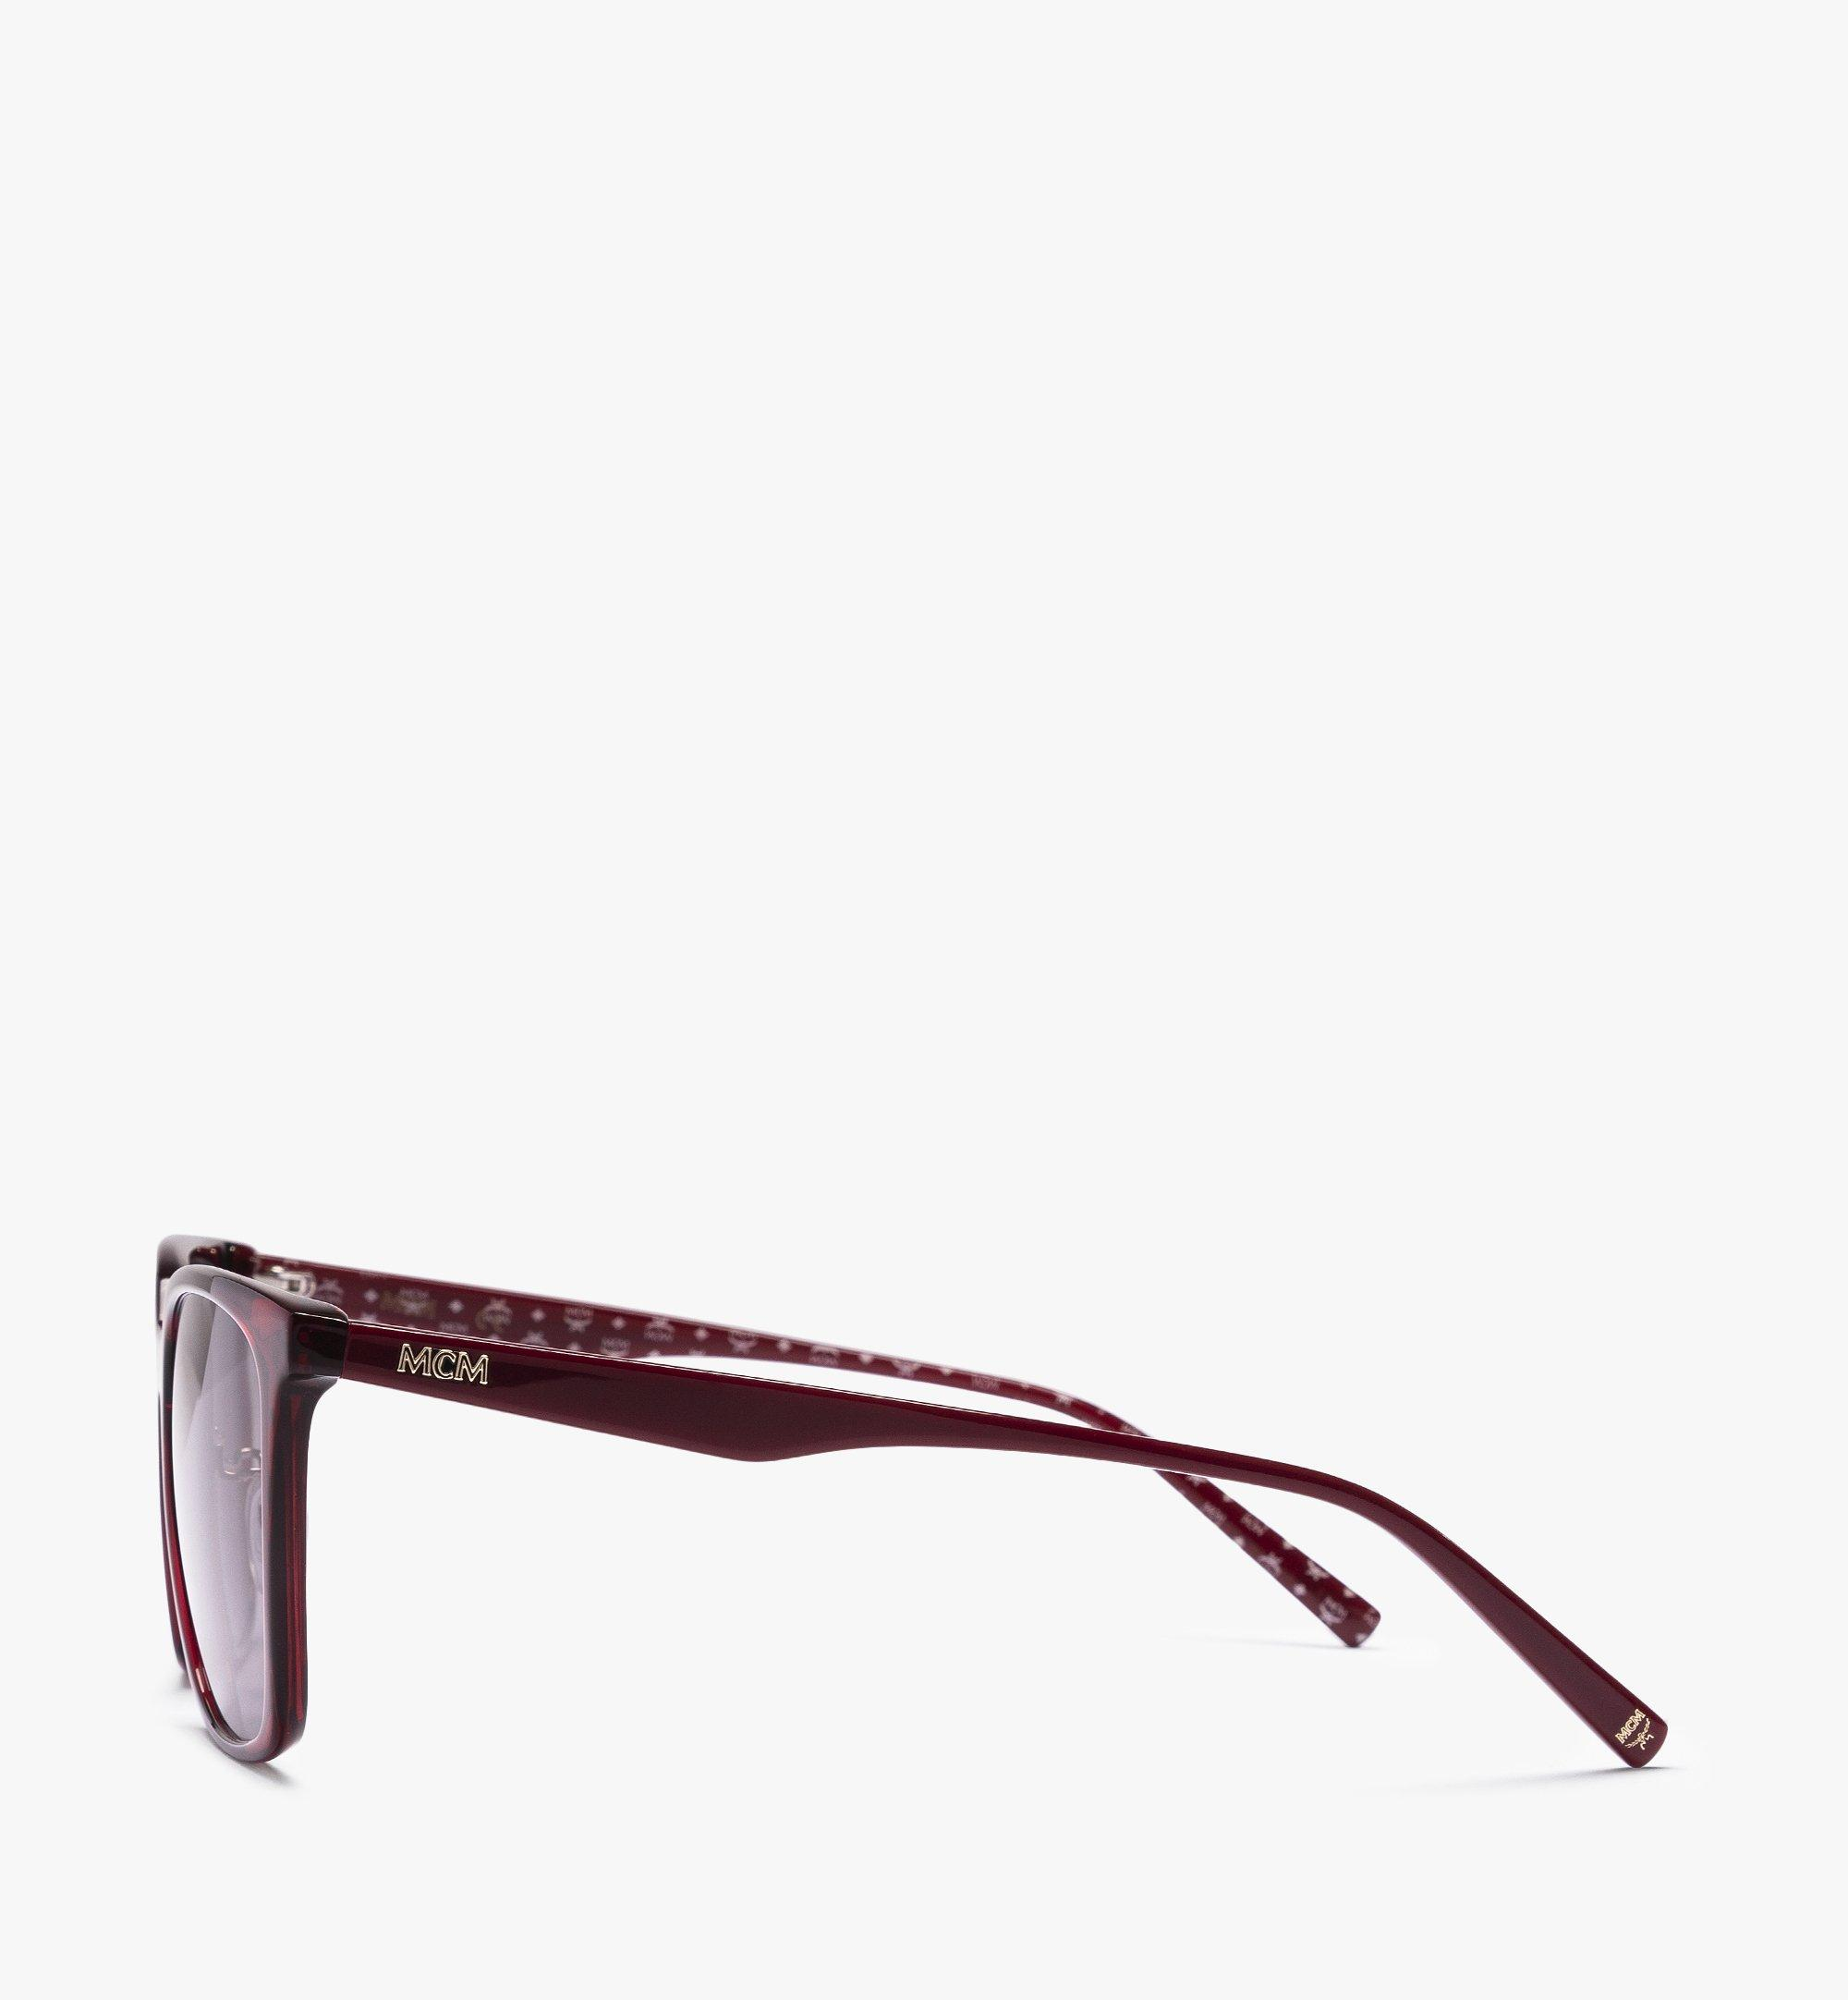 MCM MCM714SA Rectangular Sunglasses Red MEGBAMM10RB001 Alternate View 1